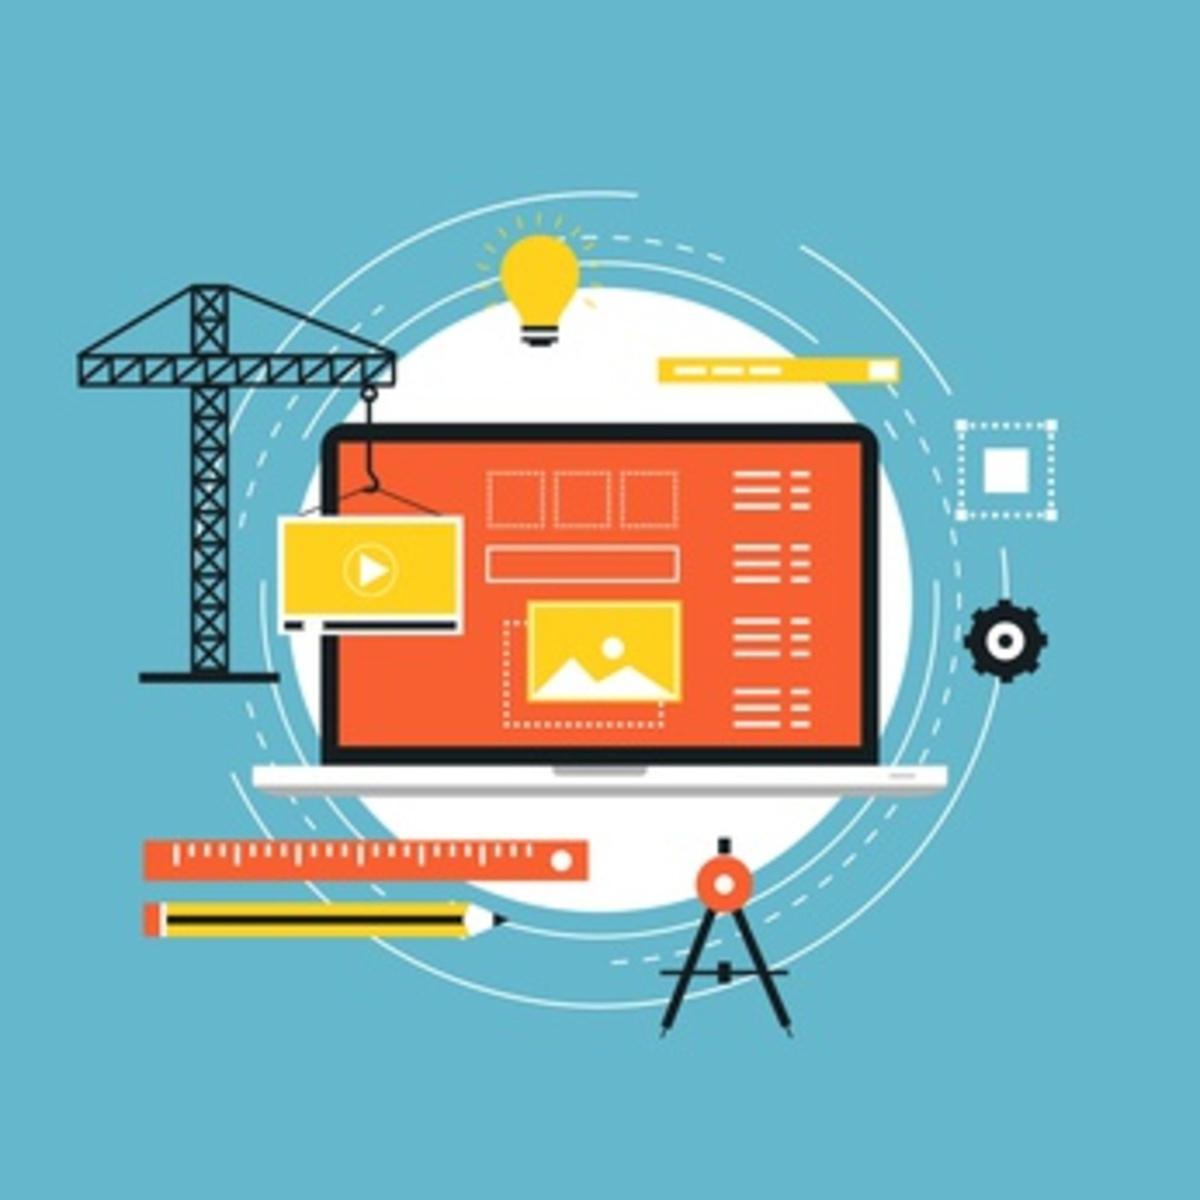 OSS】Microsoft、UIテストスクリプト自動作成ツール「WinAppDriver UI